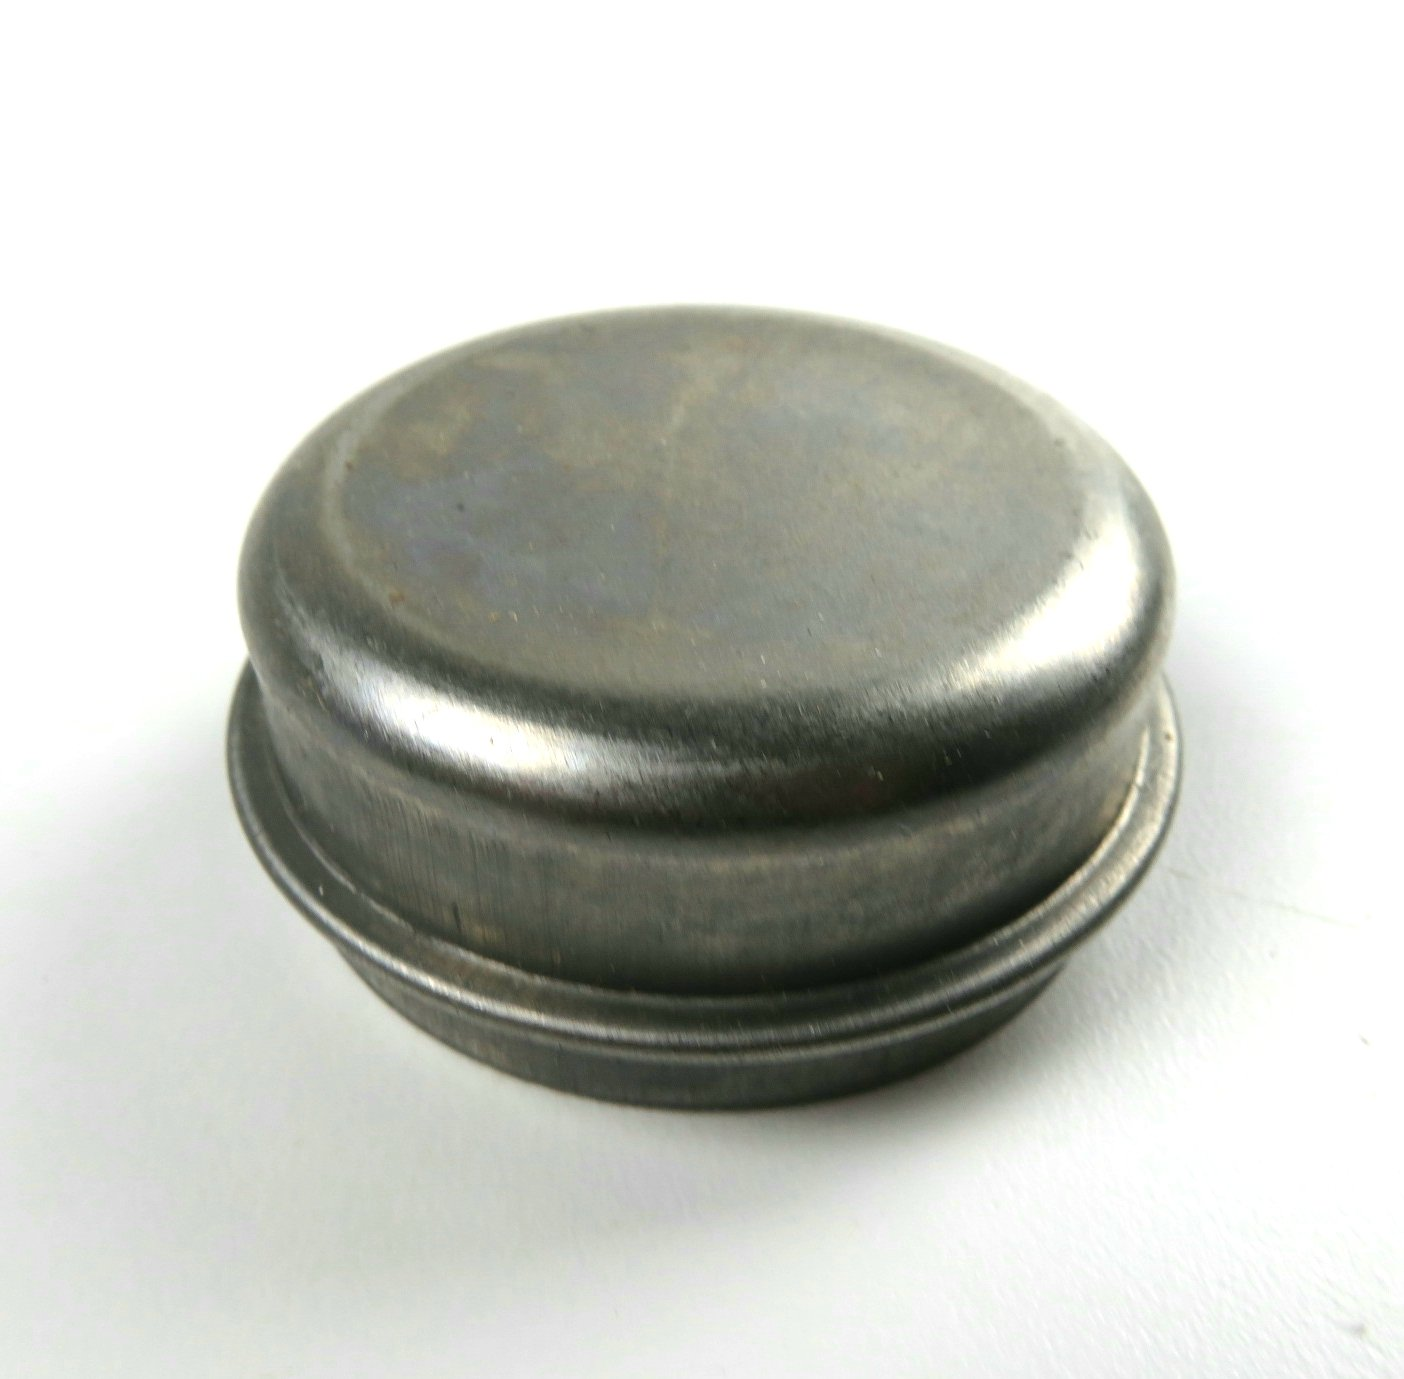 GM 15602628 CAP, FRT WHL BRG LUB